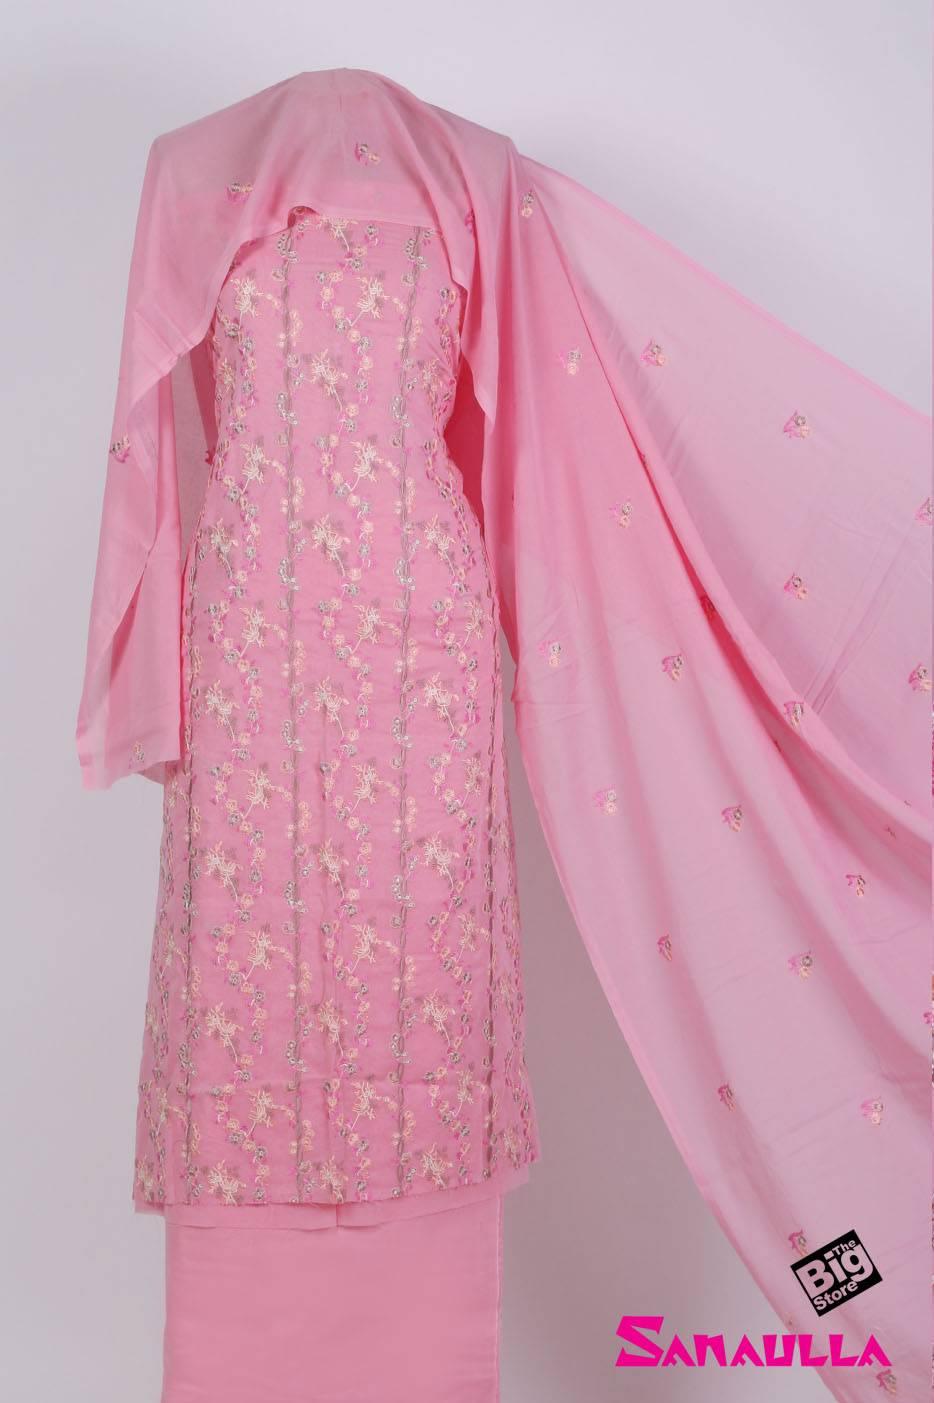 Sanaulla Exclusive Range Embroidered Swiss Voile Unstitched 3 Piece Suit SAZZ 701 Pink